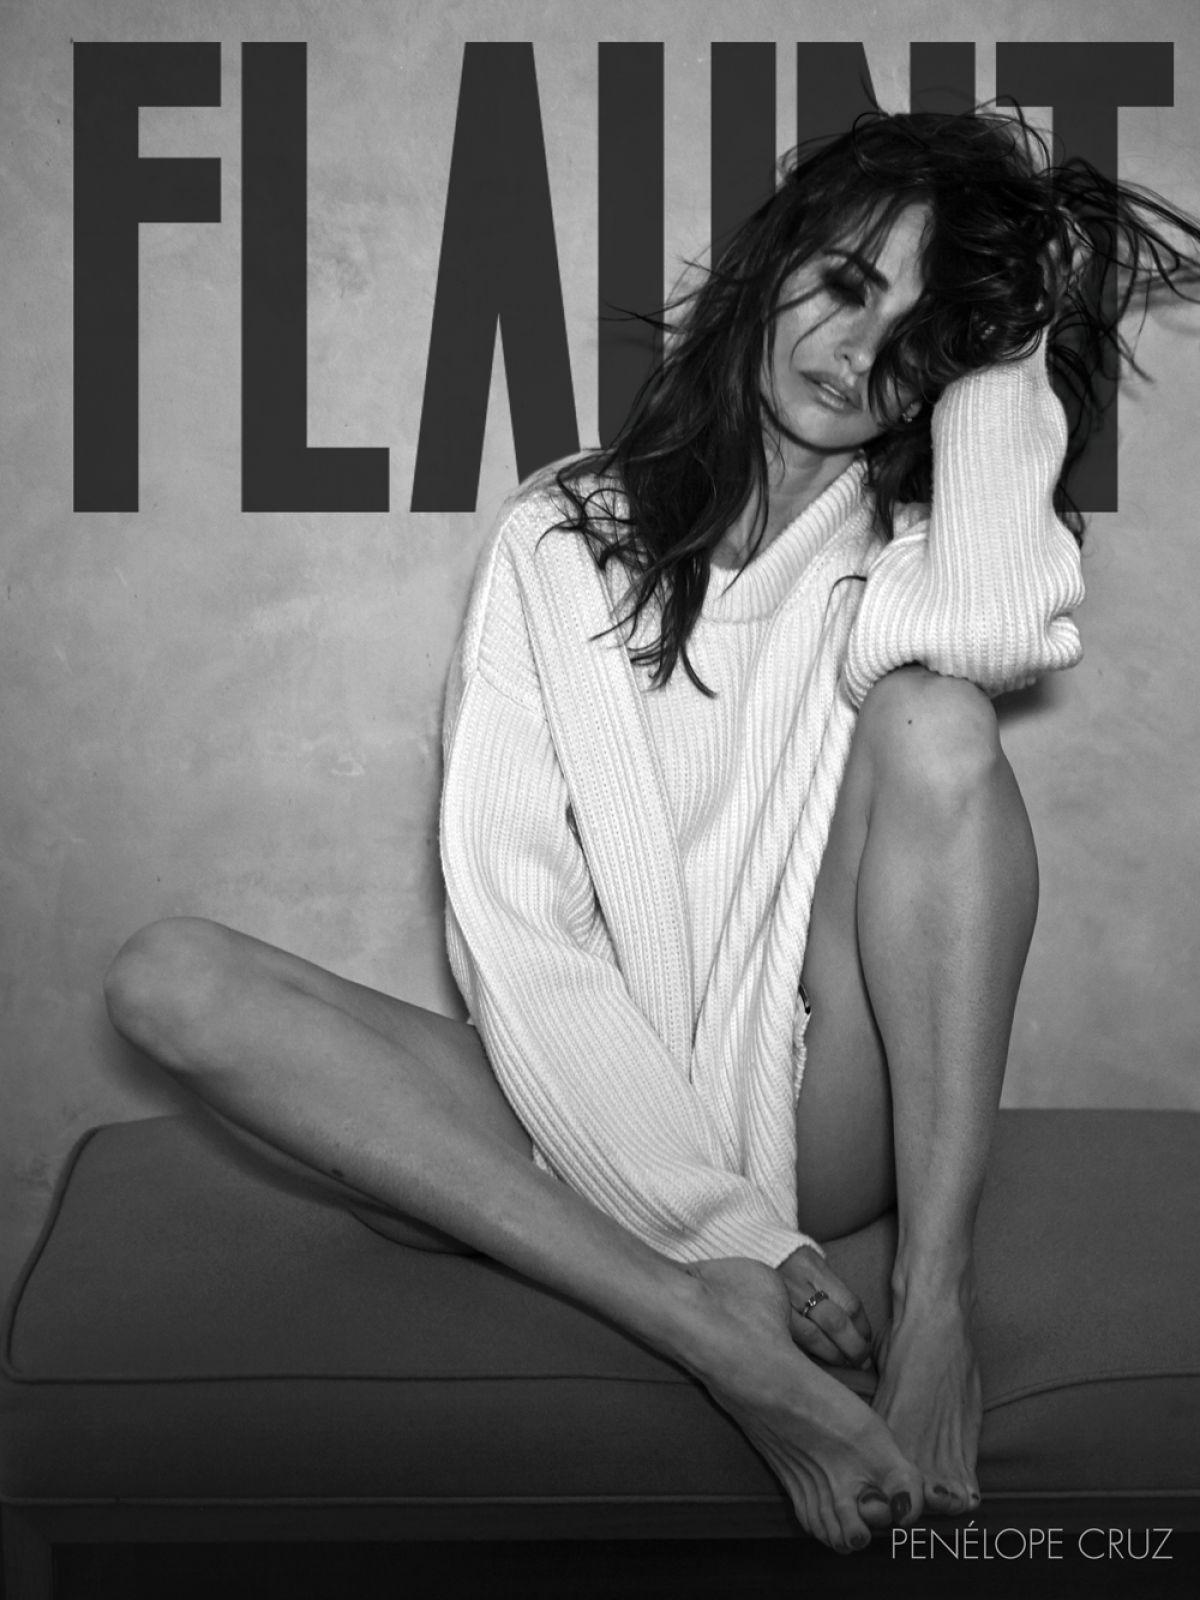 PENELOPE CRUZ in Flaunt Magazine